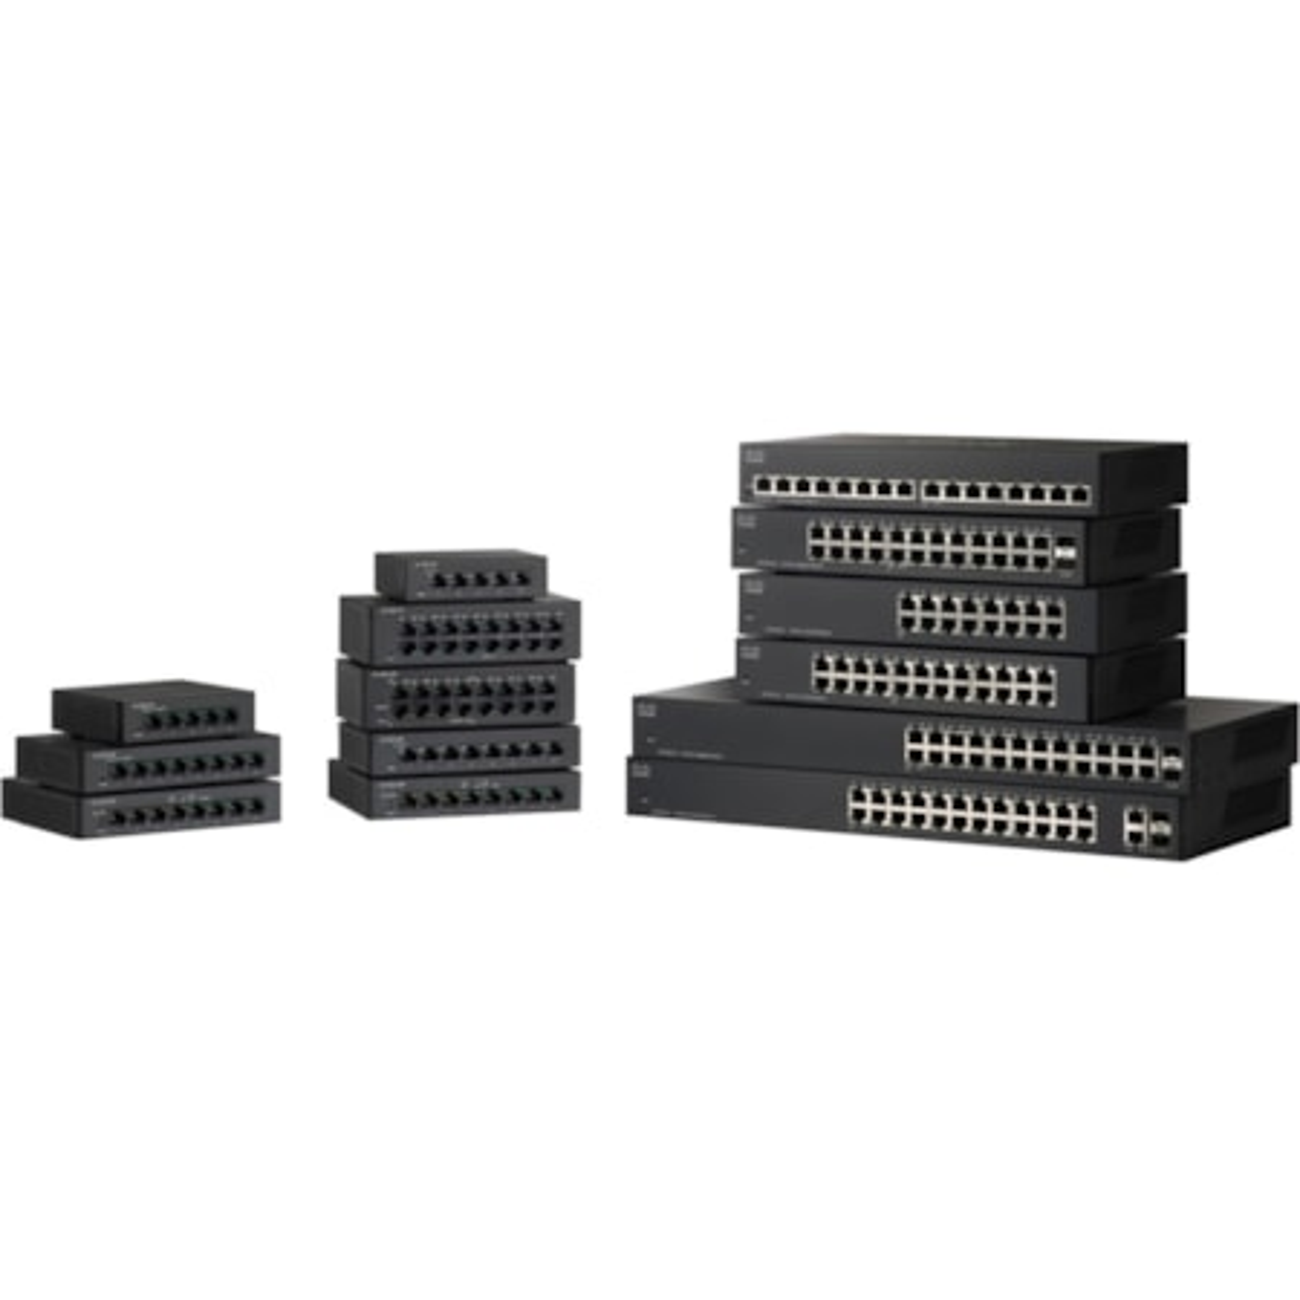 Cisco SG110-16HP 16 Ports Ethernet Switch